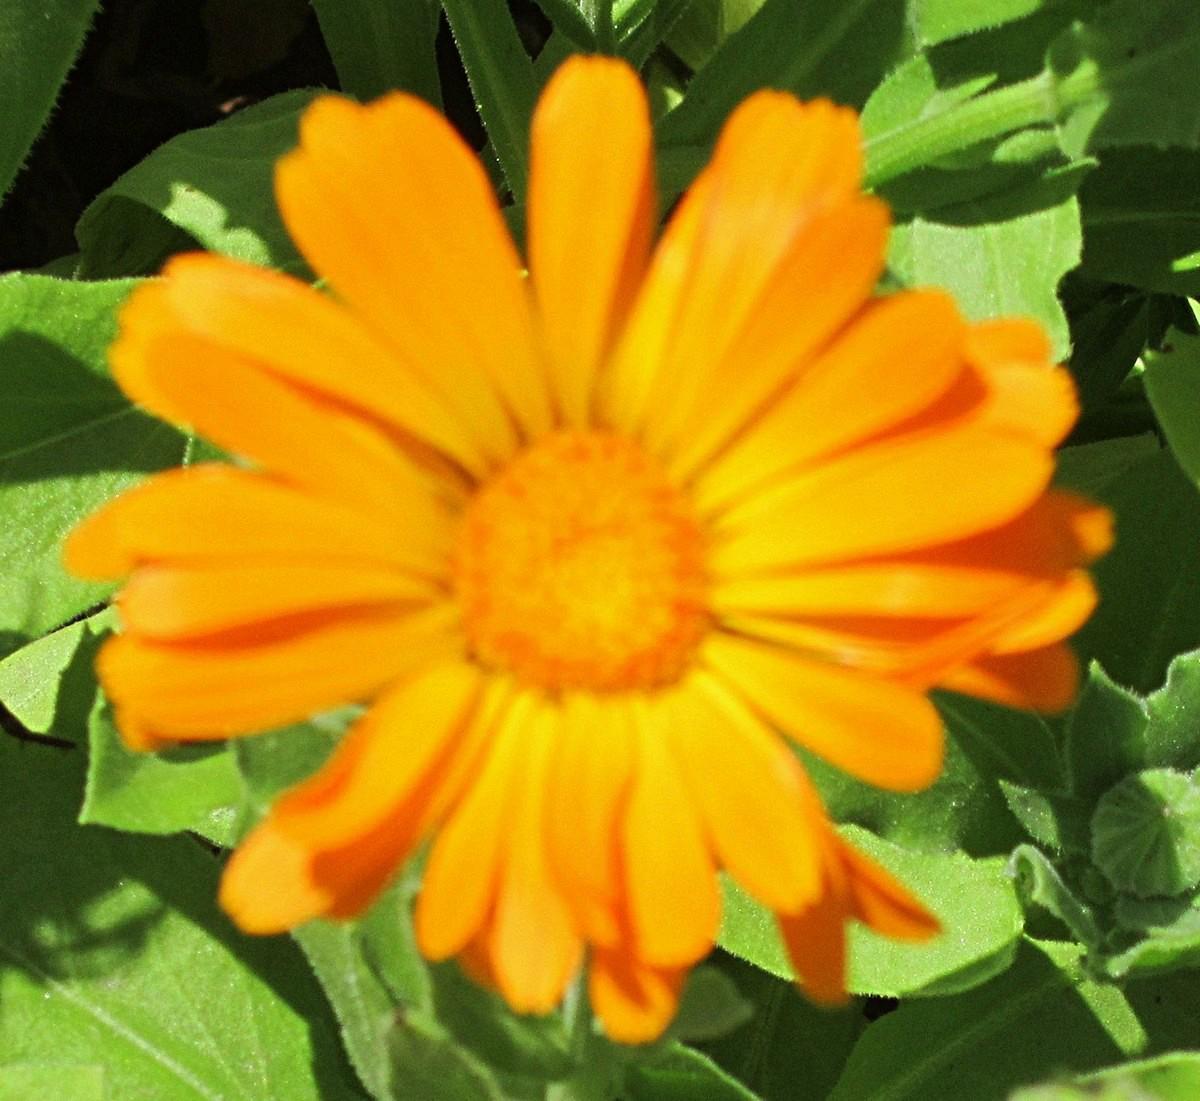 A yellow flower